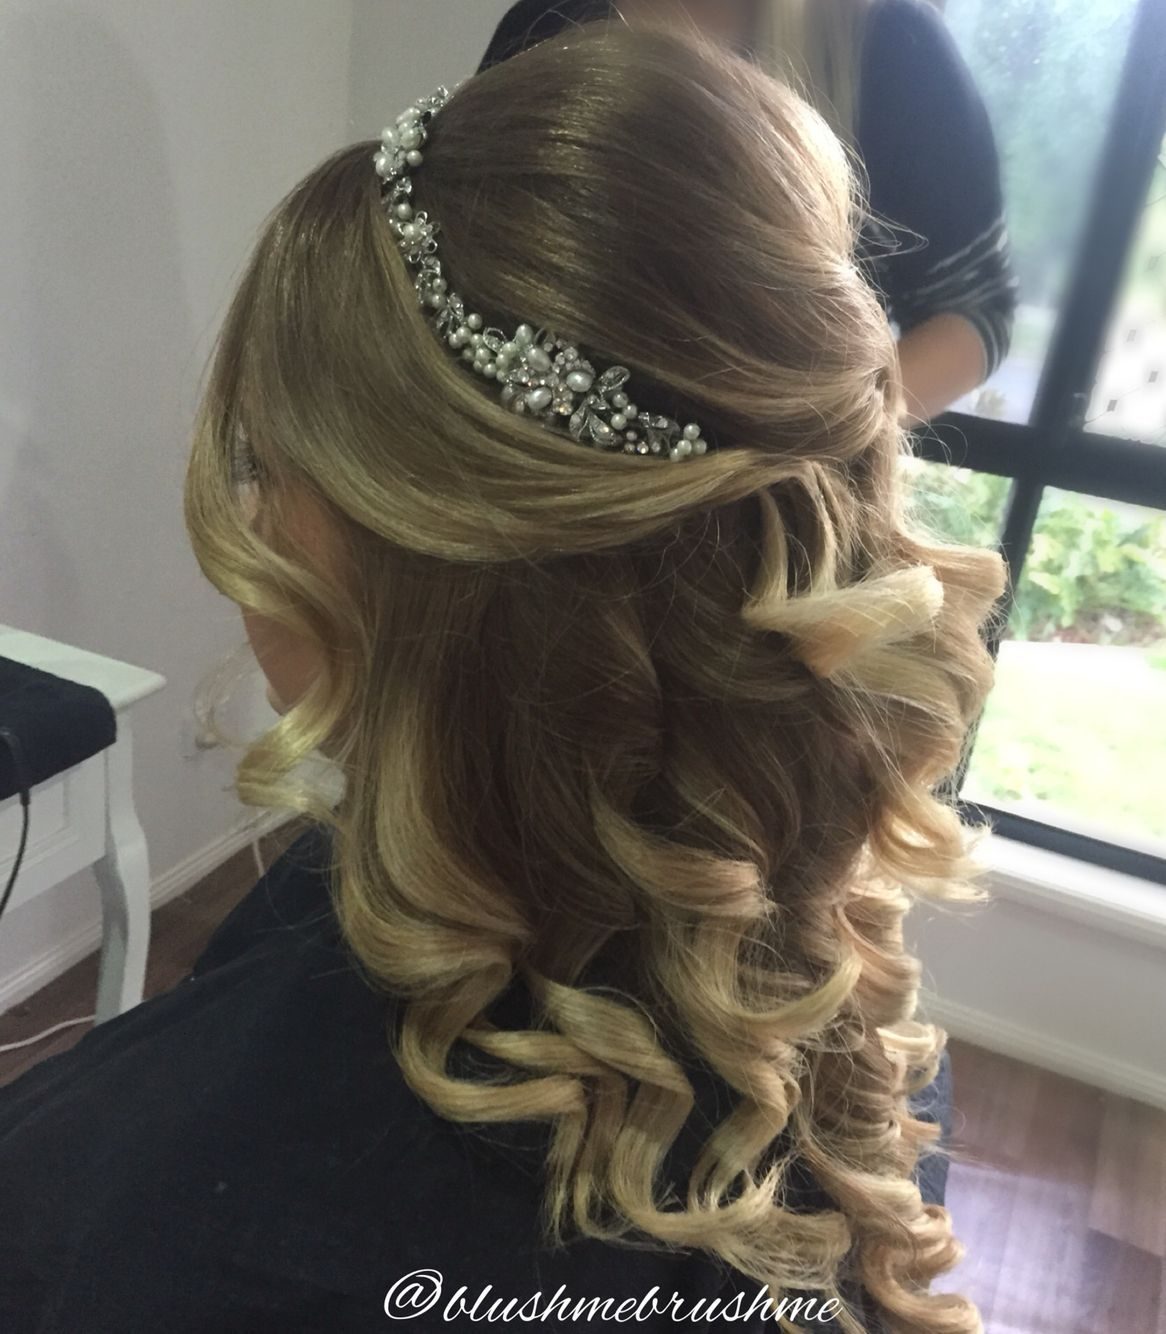 Half Up Half Down Hairstyle With Curls Headband Done By Myself Weddinghairshort Hair Down Styles Beautiful Wedding Hair Headband Hairstyles